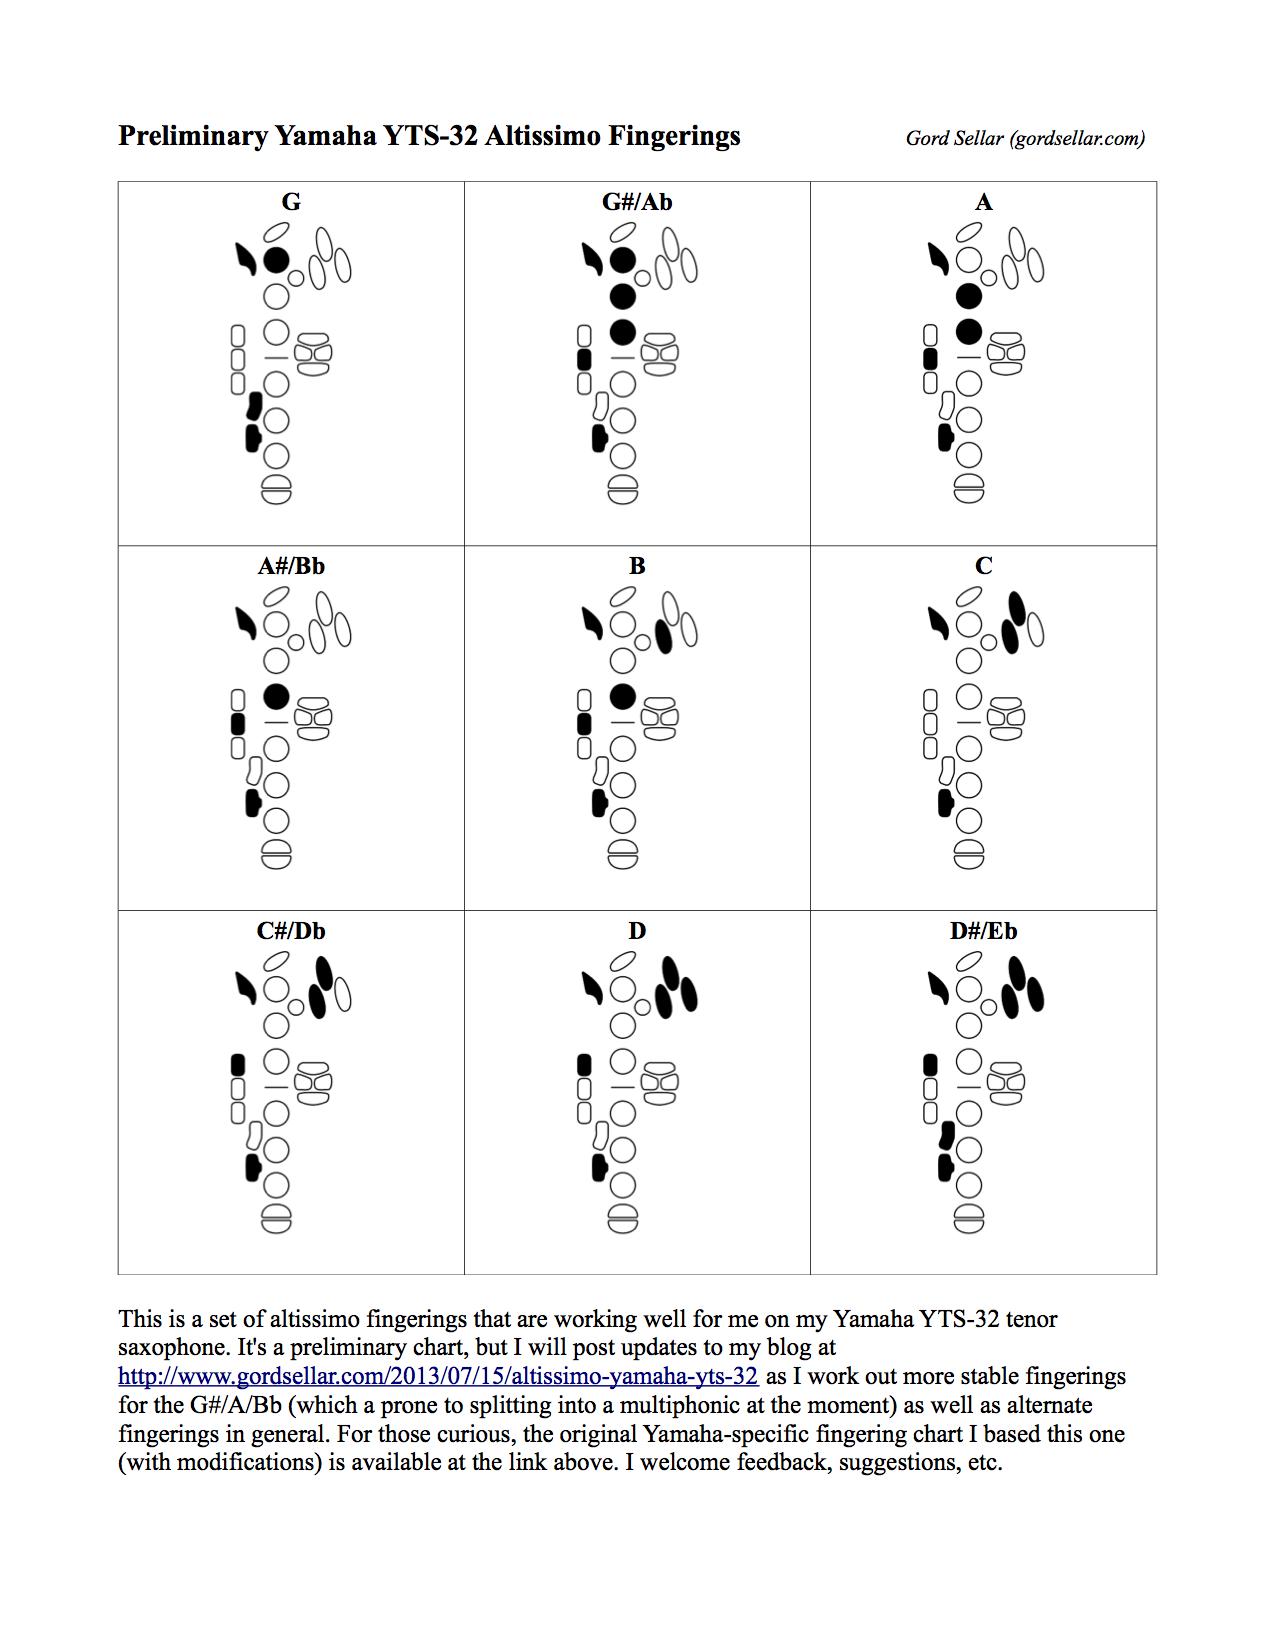 Seven of nine hentai